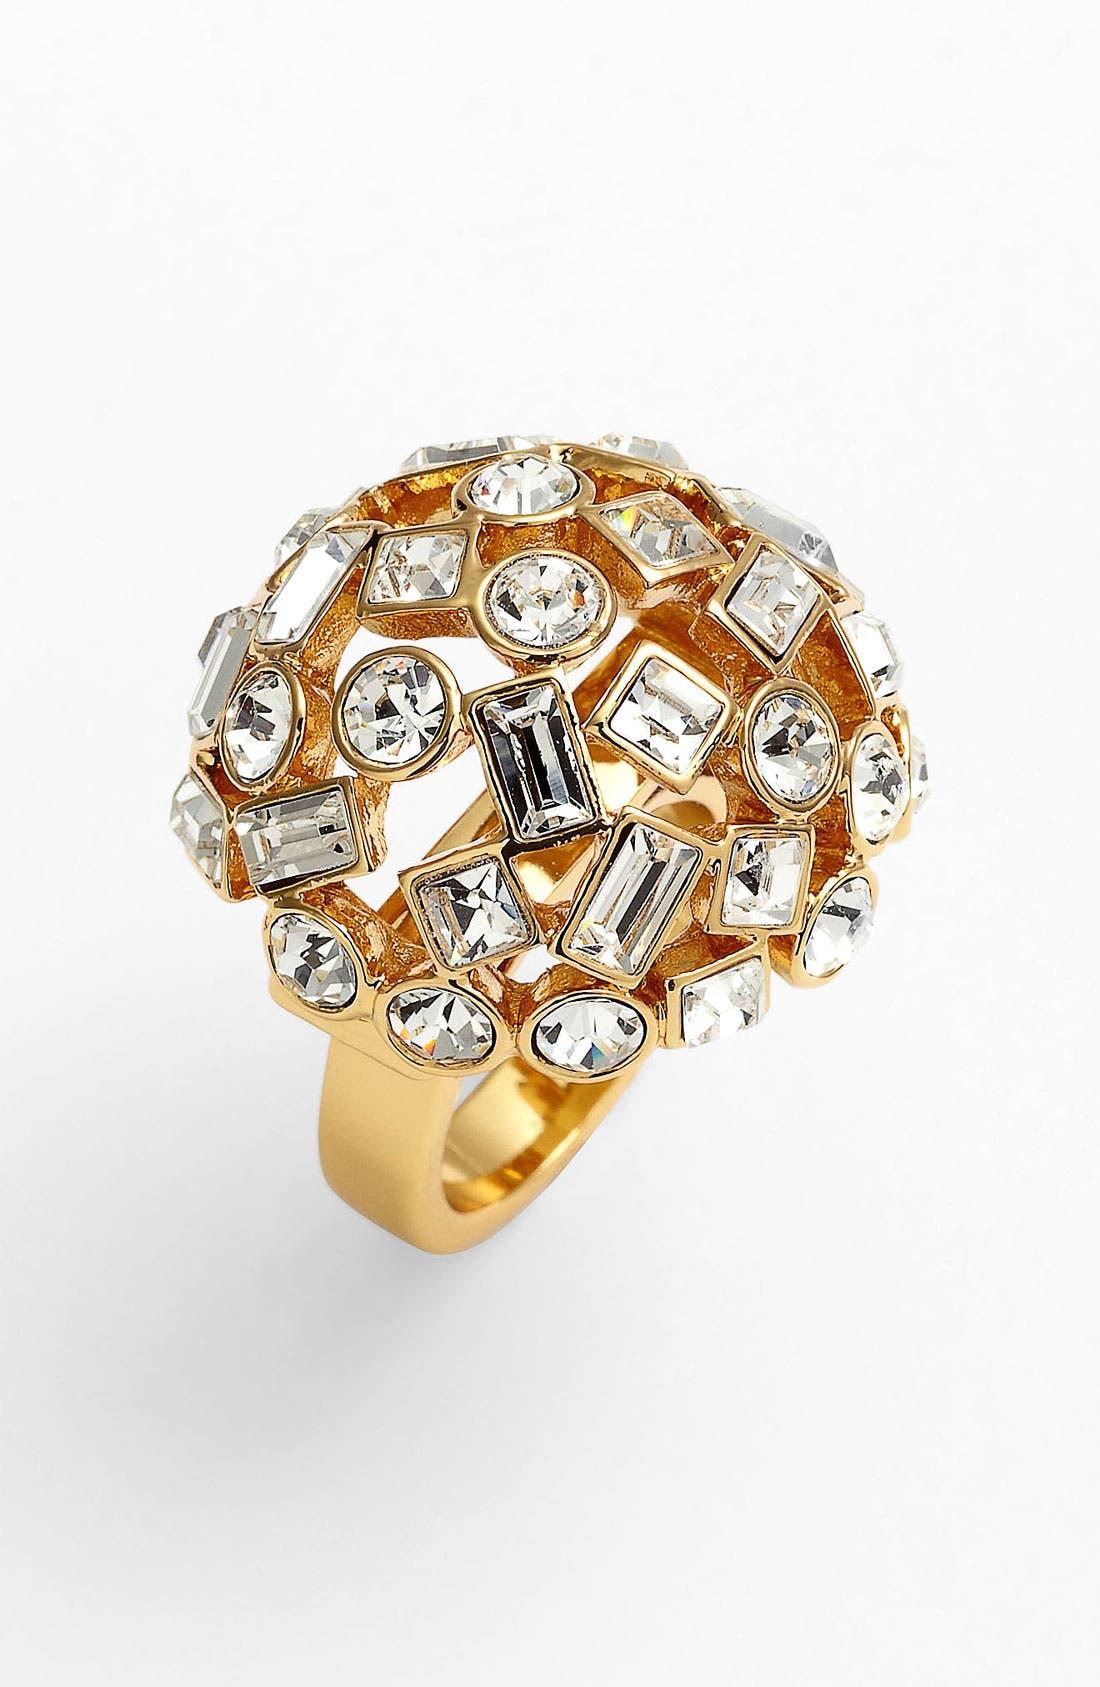 Alternate Image 1 Selected - kate spade new york 'kaleidoball' dome ring